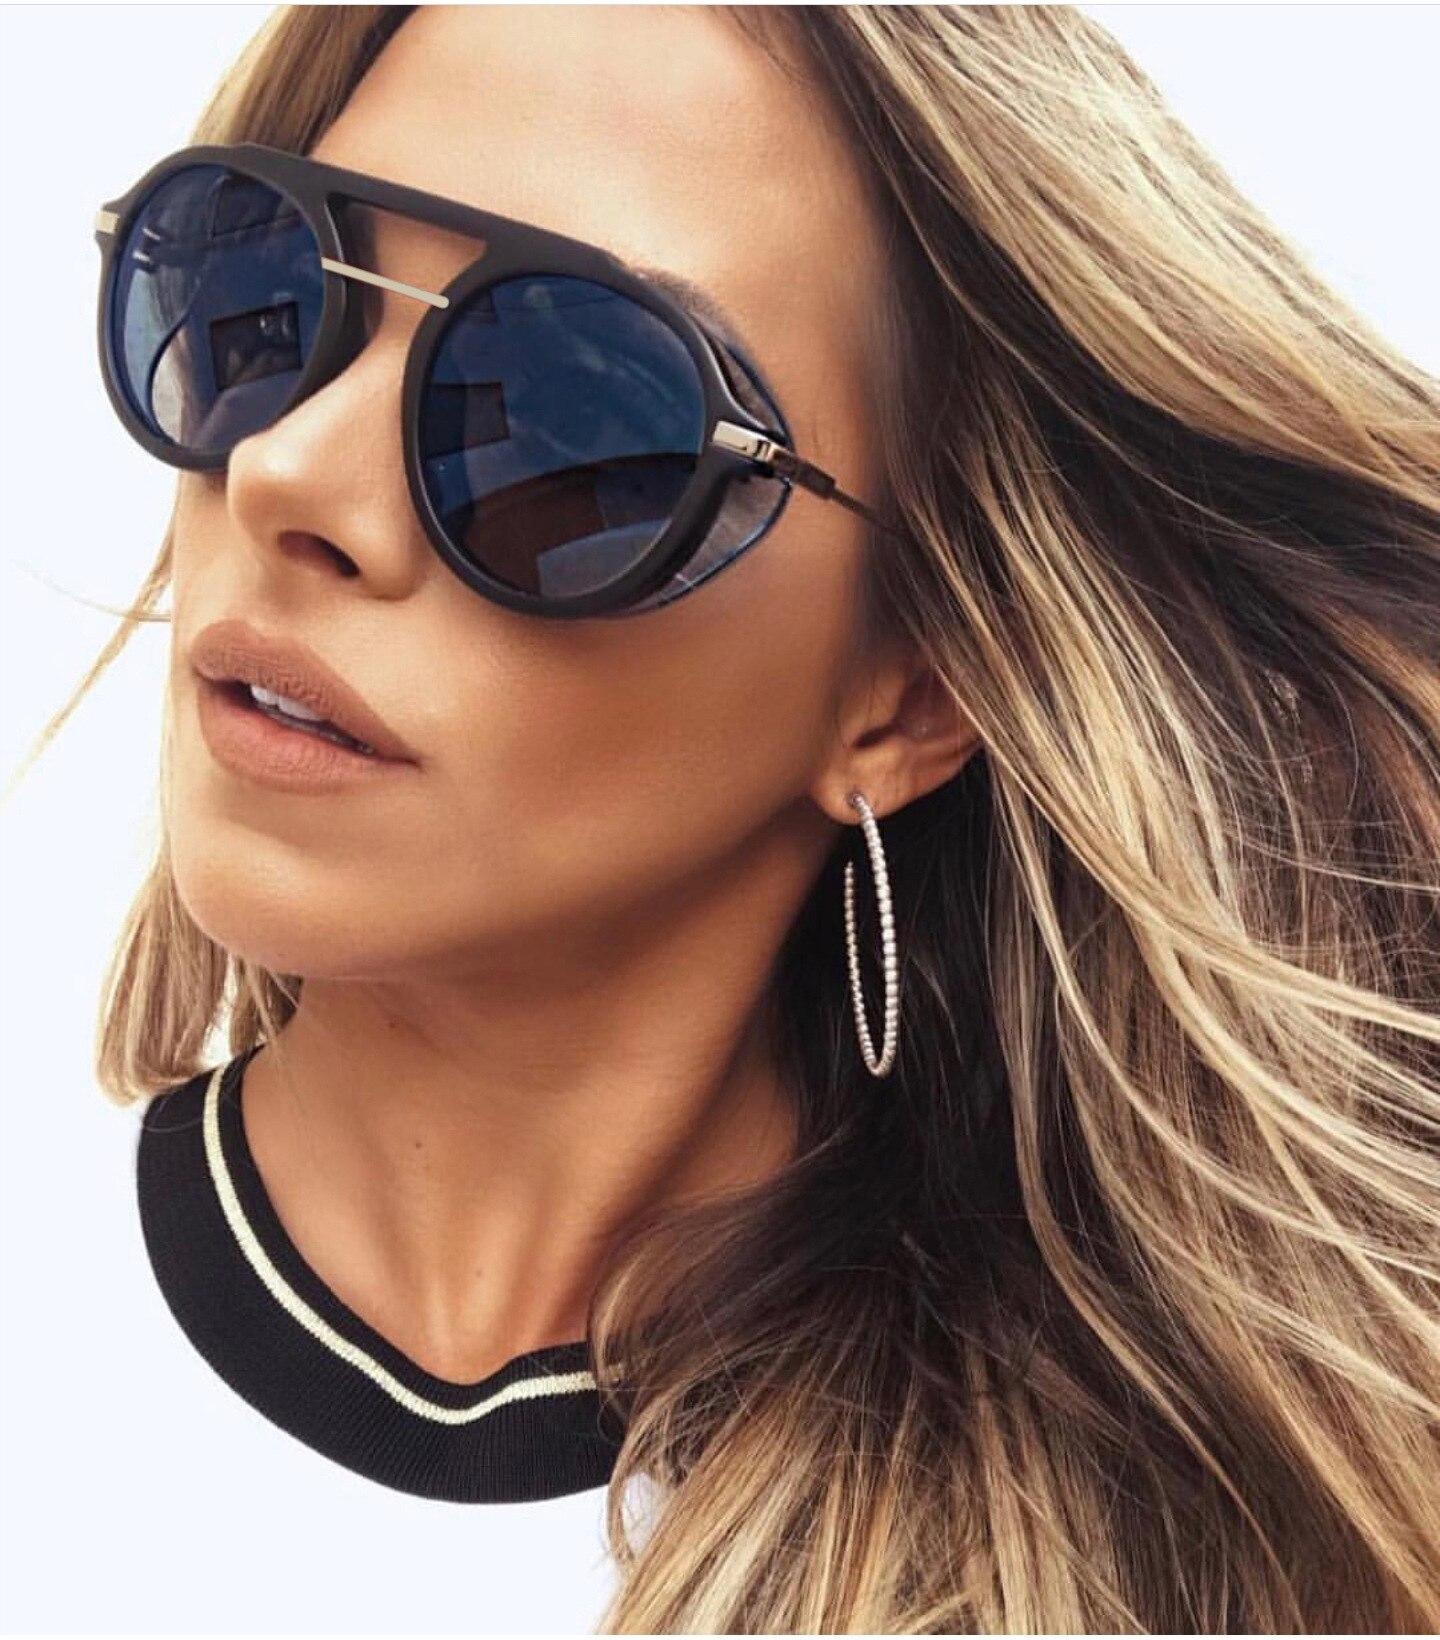 Steampunk Men Sunglasses Women Oversized  Luxury Brand Designer Sun Glasses for Women  Vintage Cat Gothic Retro Top Sellers 2018